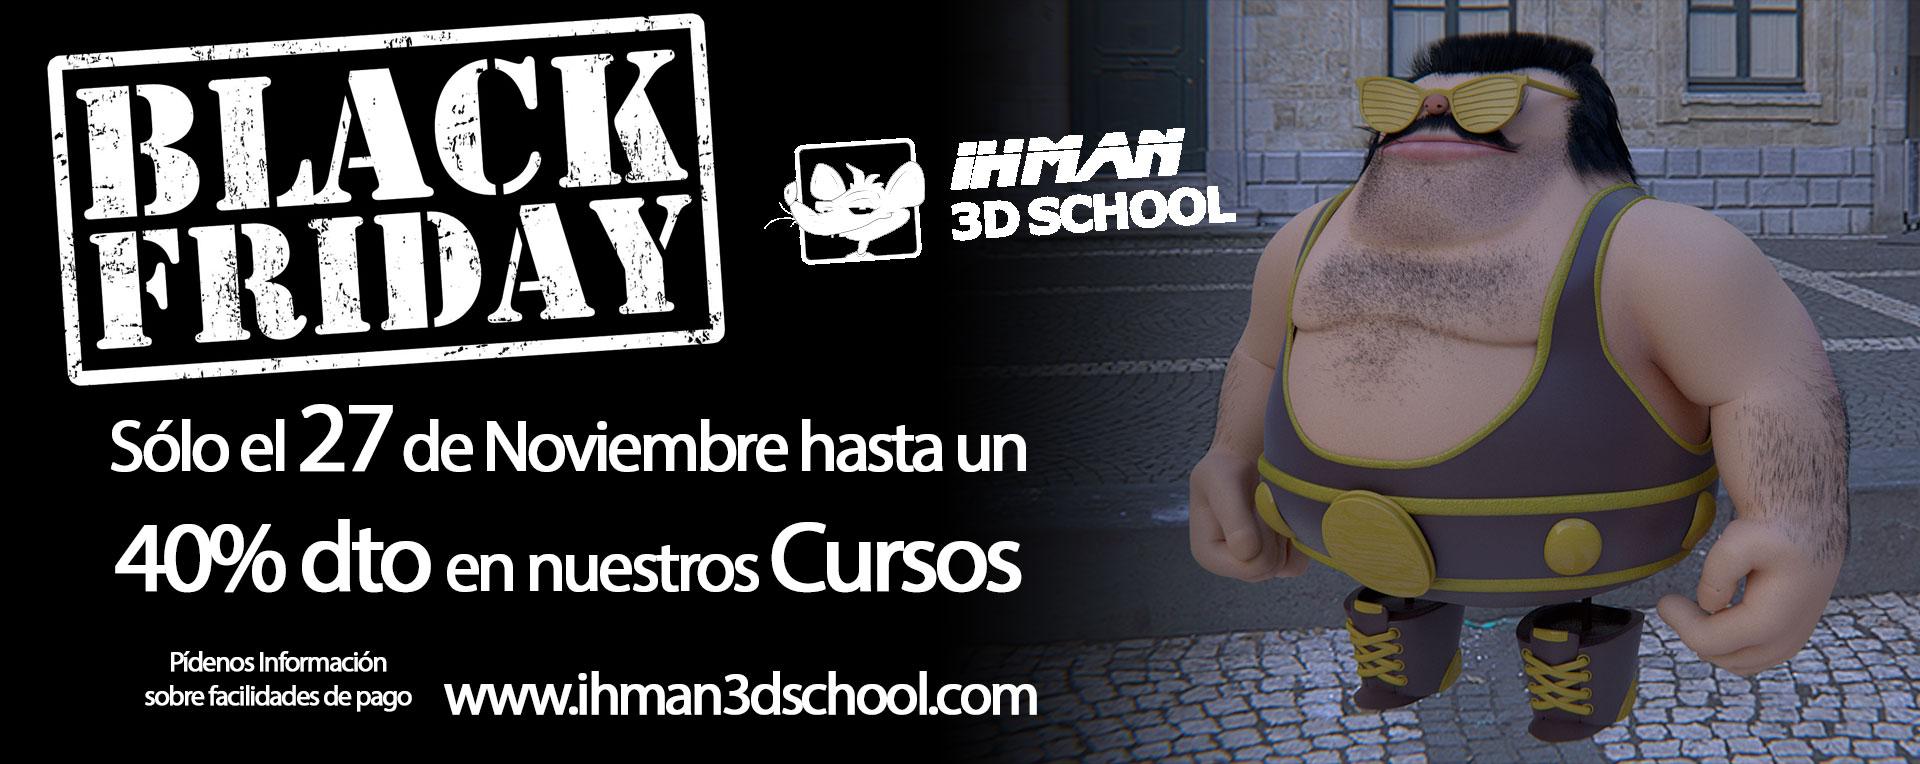 Presentación ihman 3d school-black-friday-ihman-3d-school.jpg